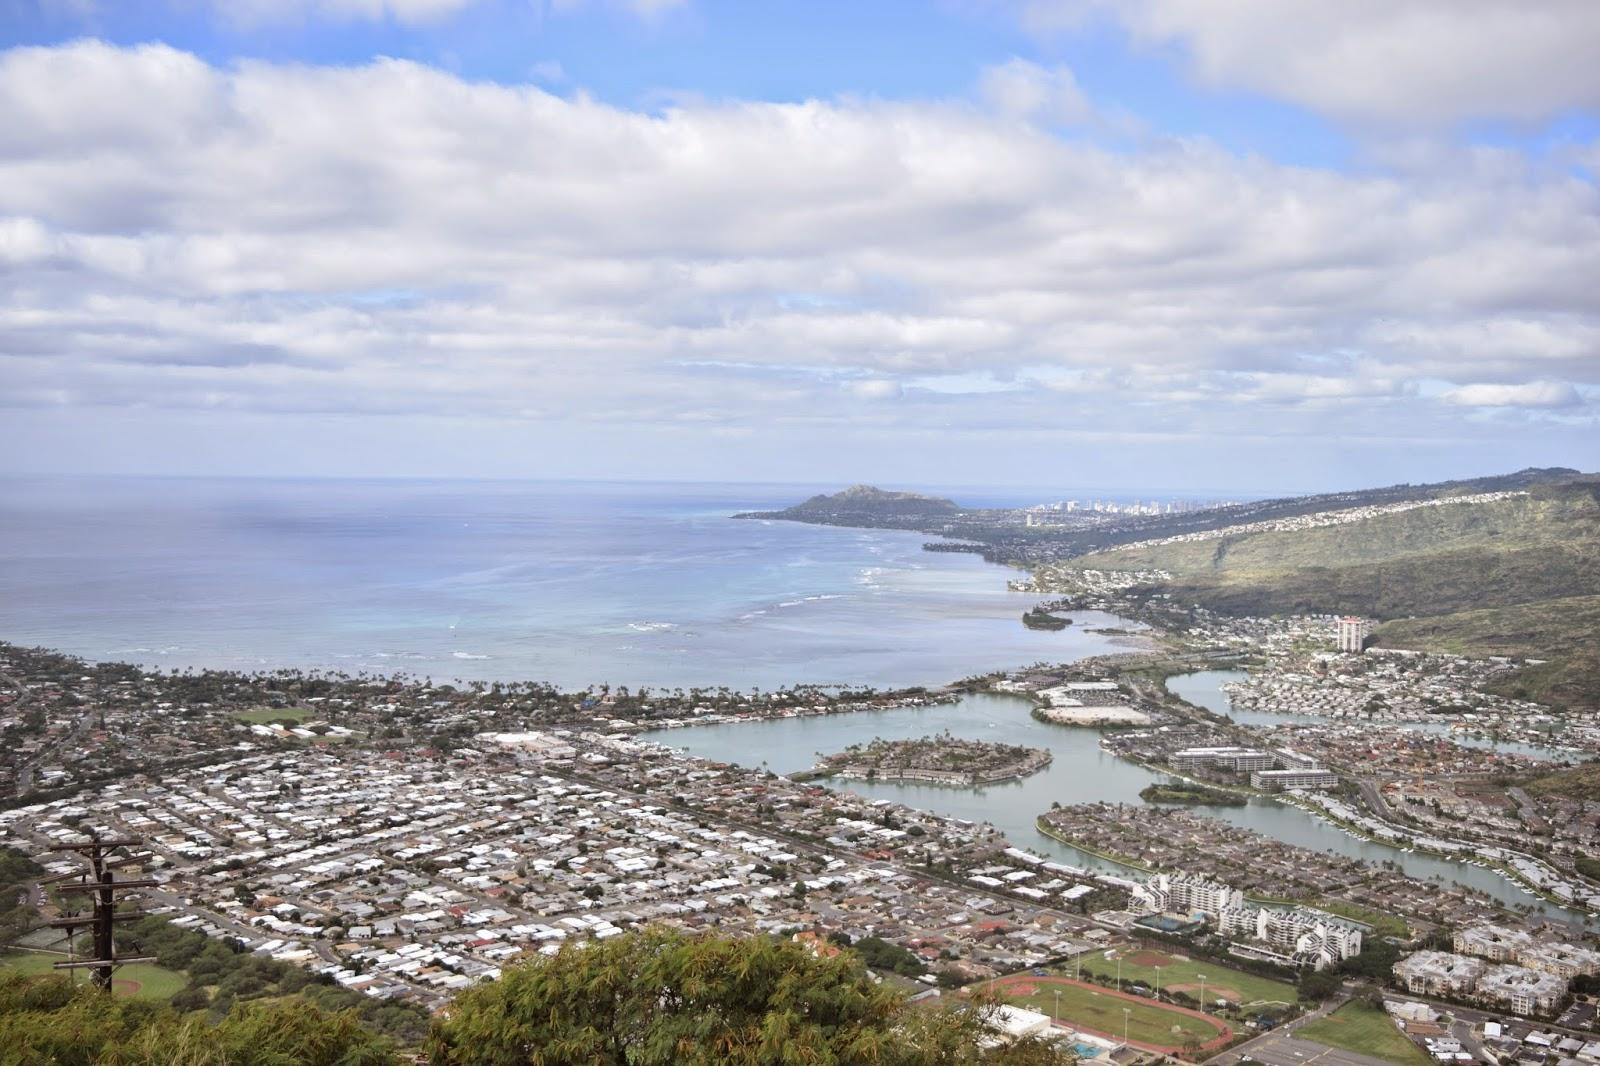 Koko Head Hike - Koko Head - Koko Head Stairs - Koko Head Trail - Best Oahu Hikes - Hikes In Hawaii - Where to Hike in Hawaii - Best Hikes On Oahu - How To Hike In Hawaii - Hawaii Itinerary - Oahu Itinerary - Activities on Oahu - Free Stuff To Do On Oahu - Free Stuff To Do Hawaii - What To Pack For Hiking In Hawaii - Hiking In Hawaii: What To Pack + Where To Go - Hiking In Hawaii - Best Hikes In Hawaii - Hawaii Hikes Oahu - Honolulu Hikes - Hawaii Hikes - Hawaii Hiking Trails - Best Hiking Spots In Hawaii - Best Trails In Hawaii - Best Hiking Trails In Hawaii - Communikait by Kait Hanson #oahu #honolulu #hawaii #hikinginhawaii